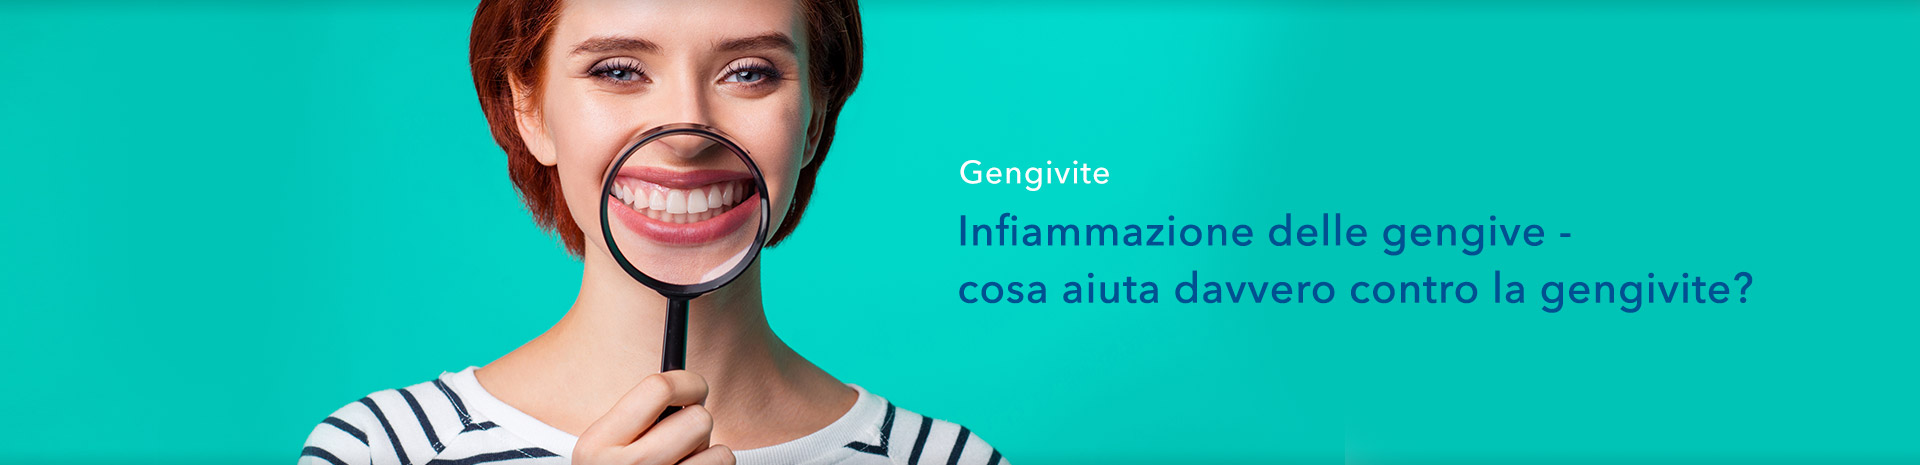 Gengivite - GUIDA - SHOP FARMACIA